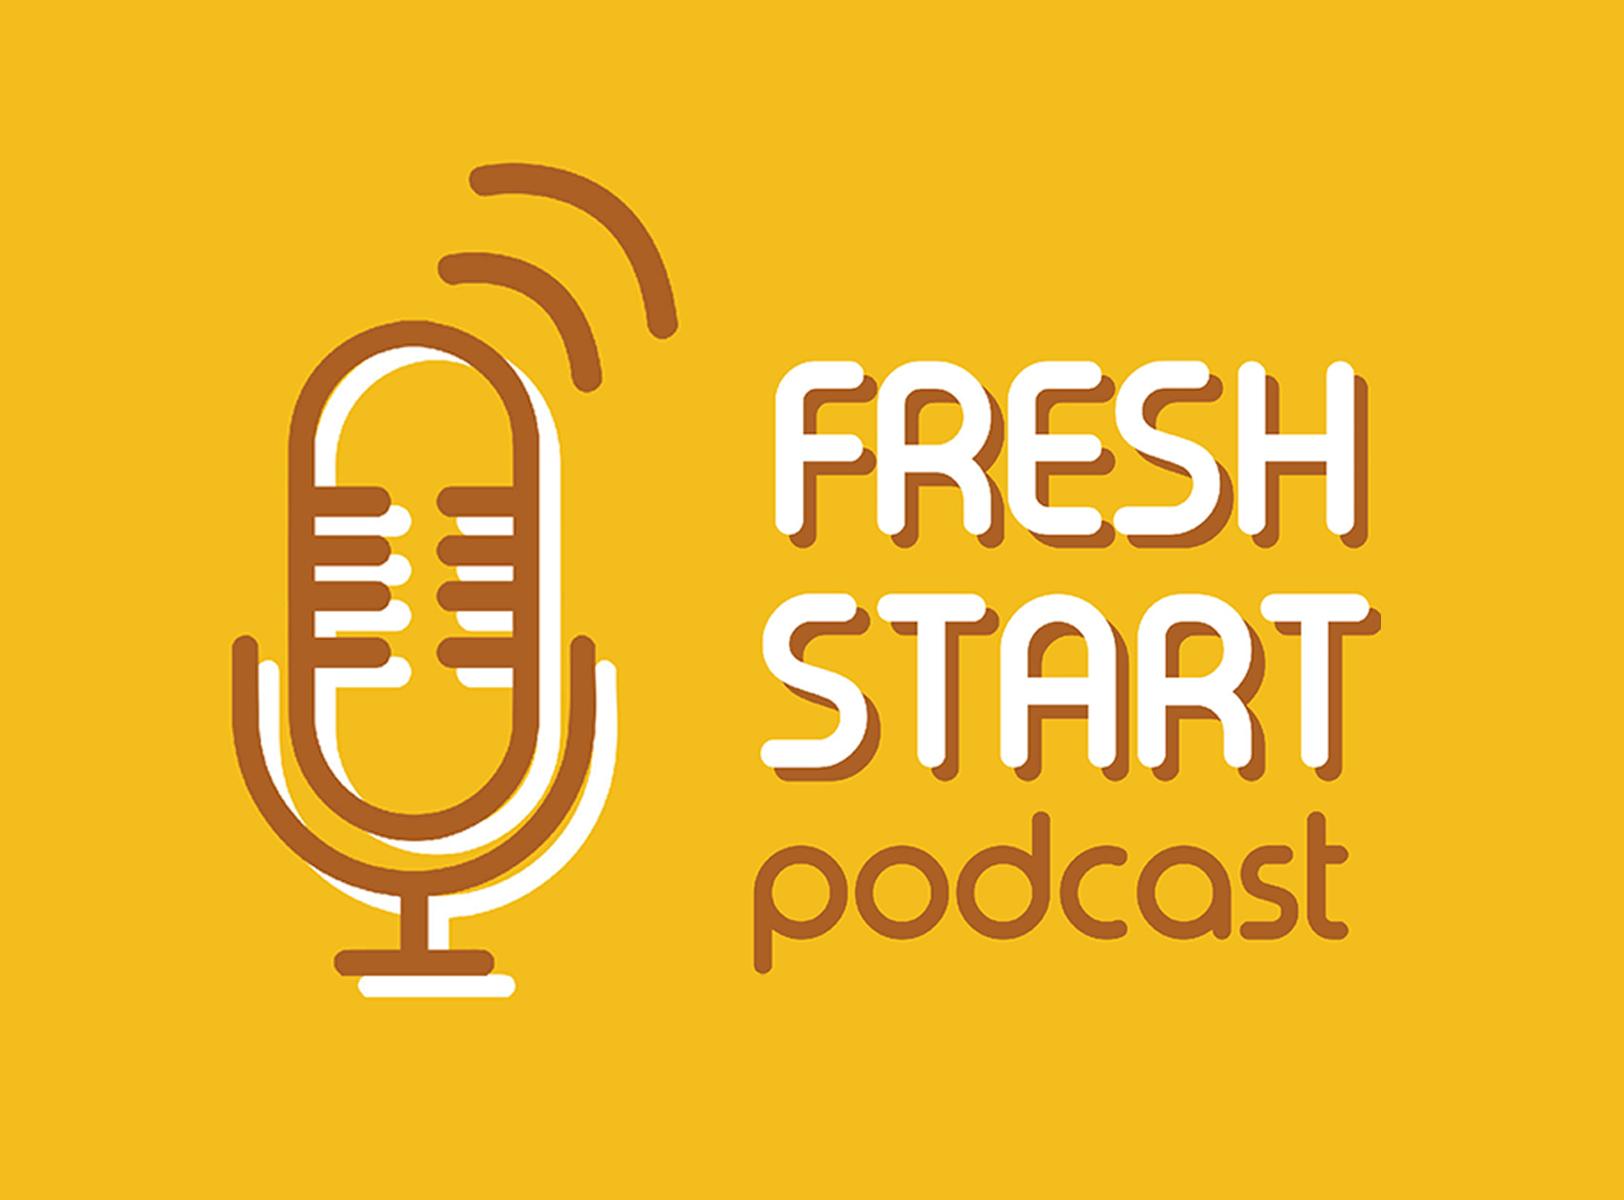 Fresh Start: Podcast News (11/16/2018 Fri.)